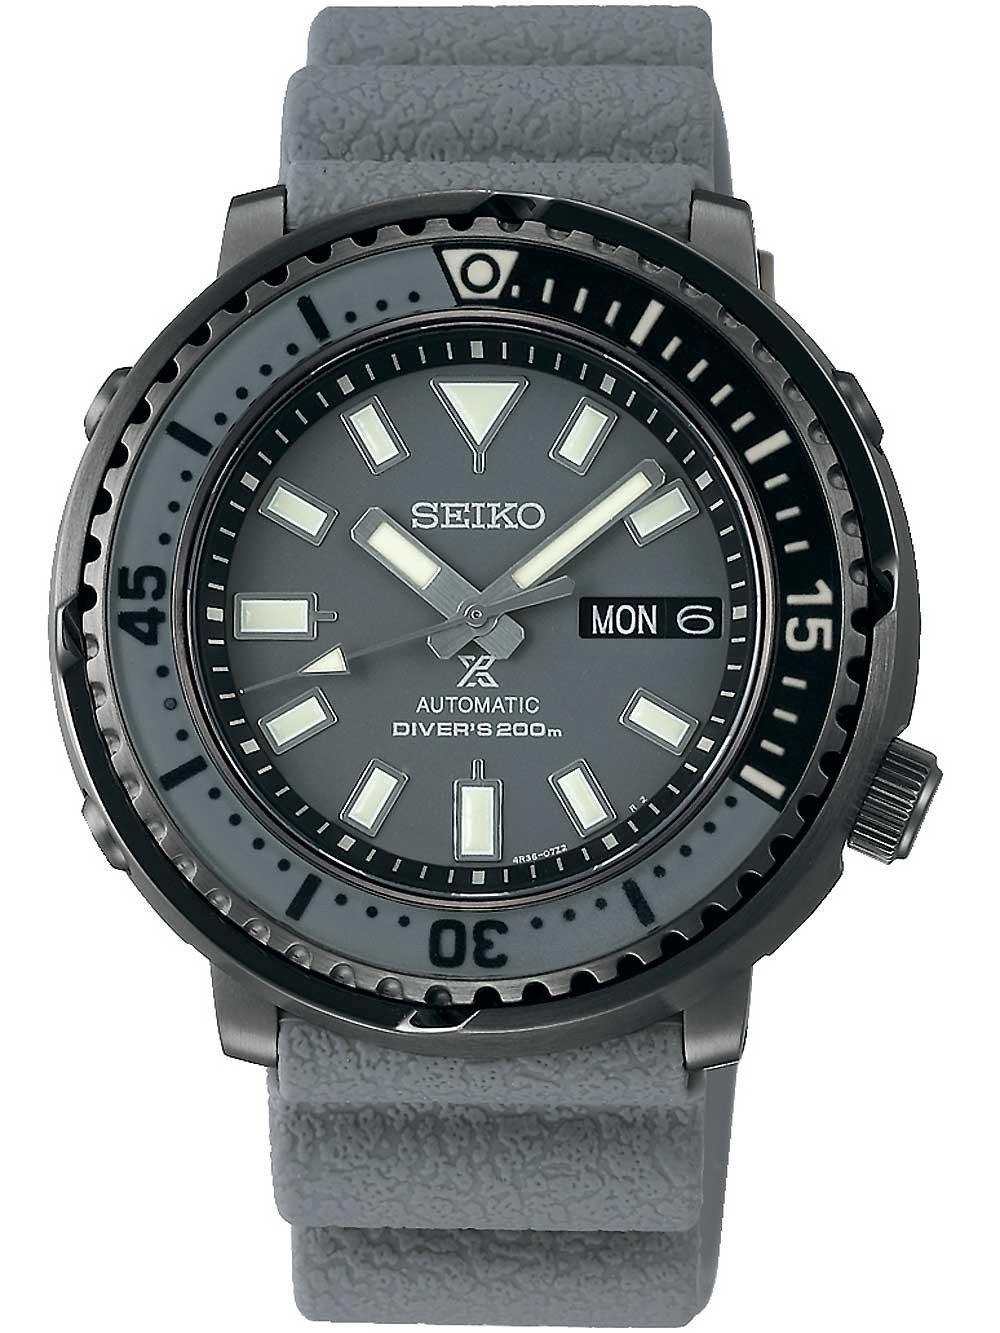 [TimeShop24] Seiko SRPE31K1 Street Urban Safari Tuna 43mm Automatik Diver